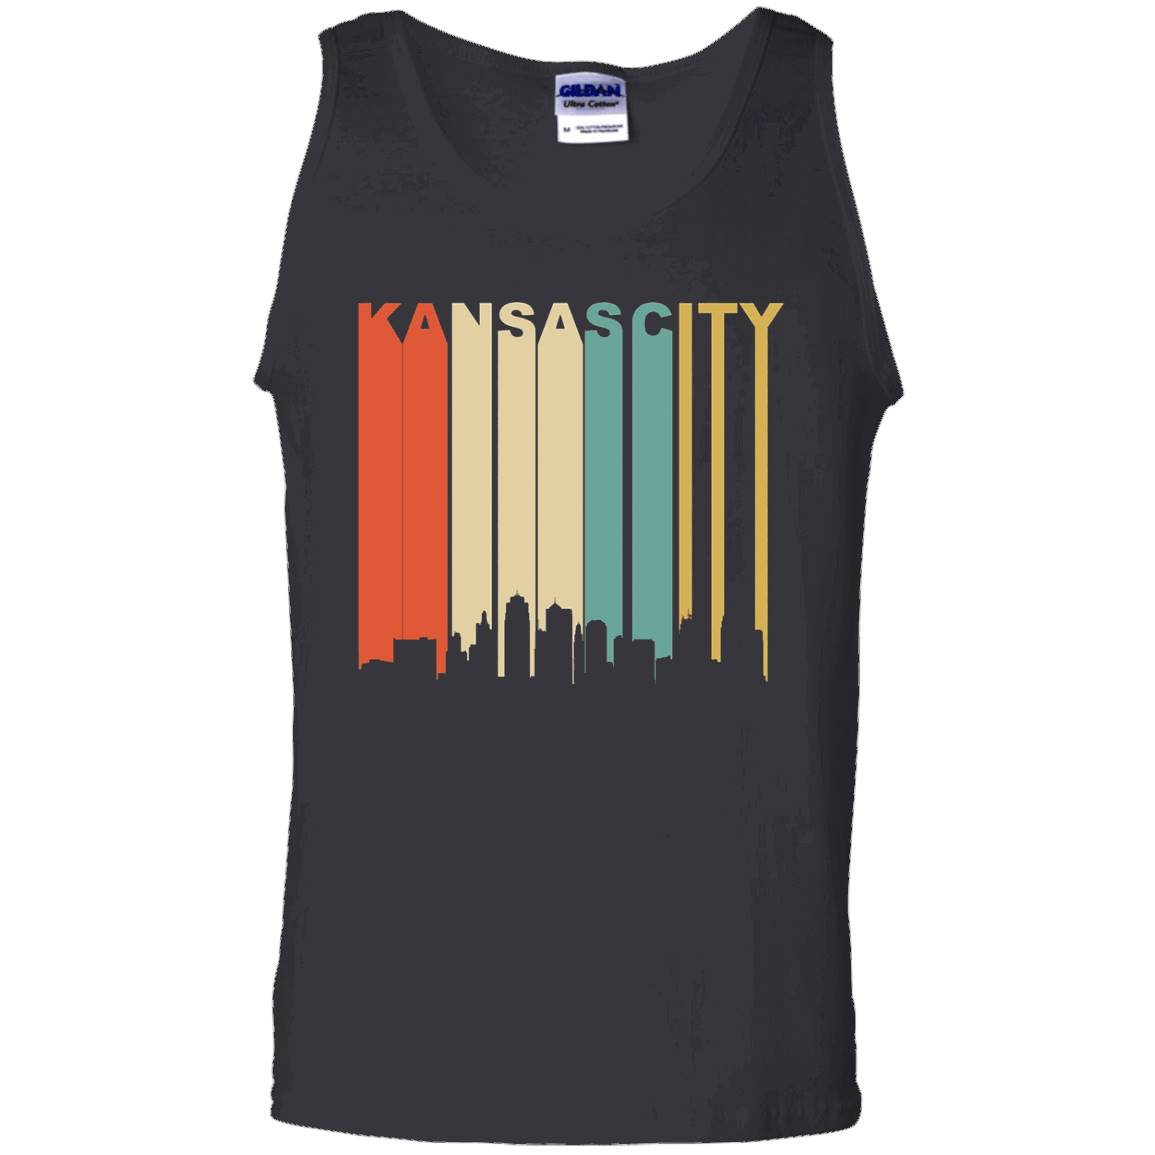 Retro 1970's Kansas City Missouri Downtown Skyline T-Shirt – Tank Top